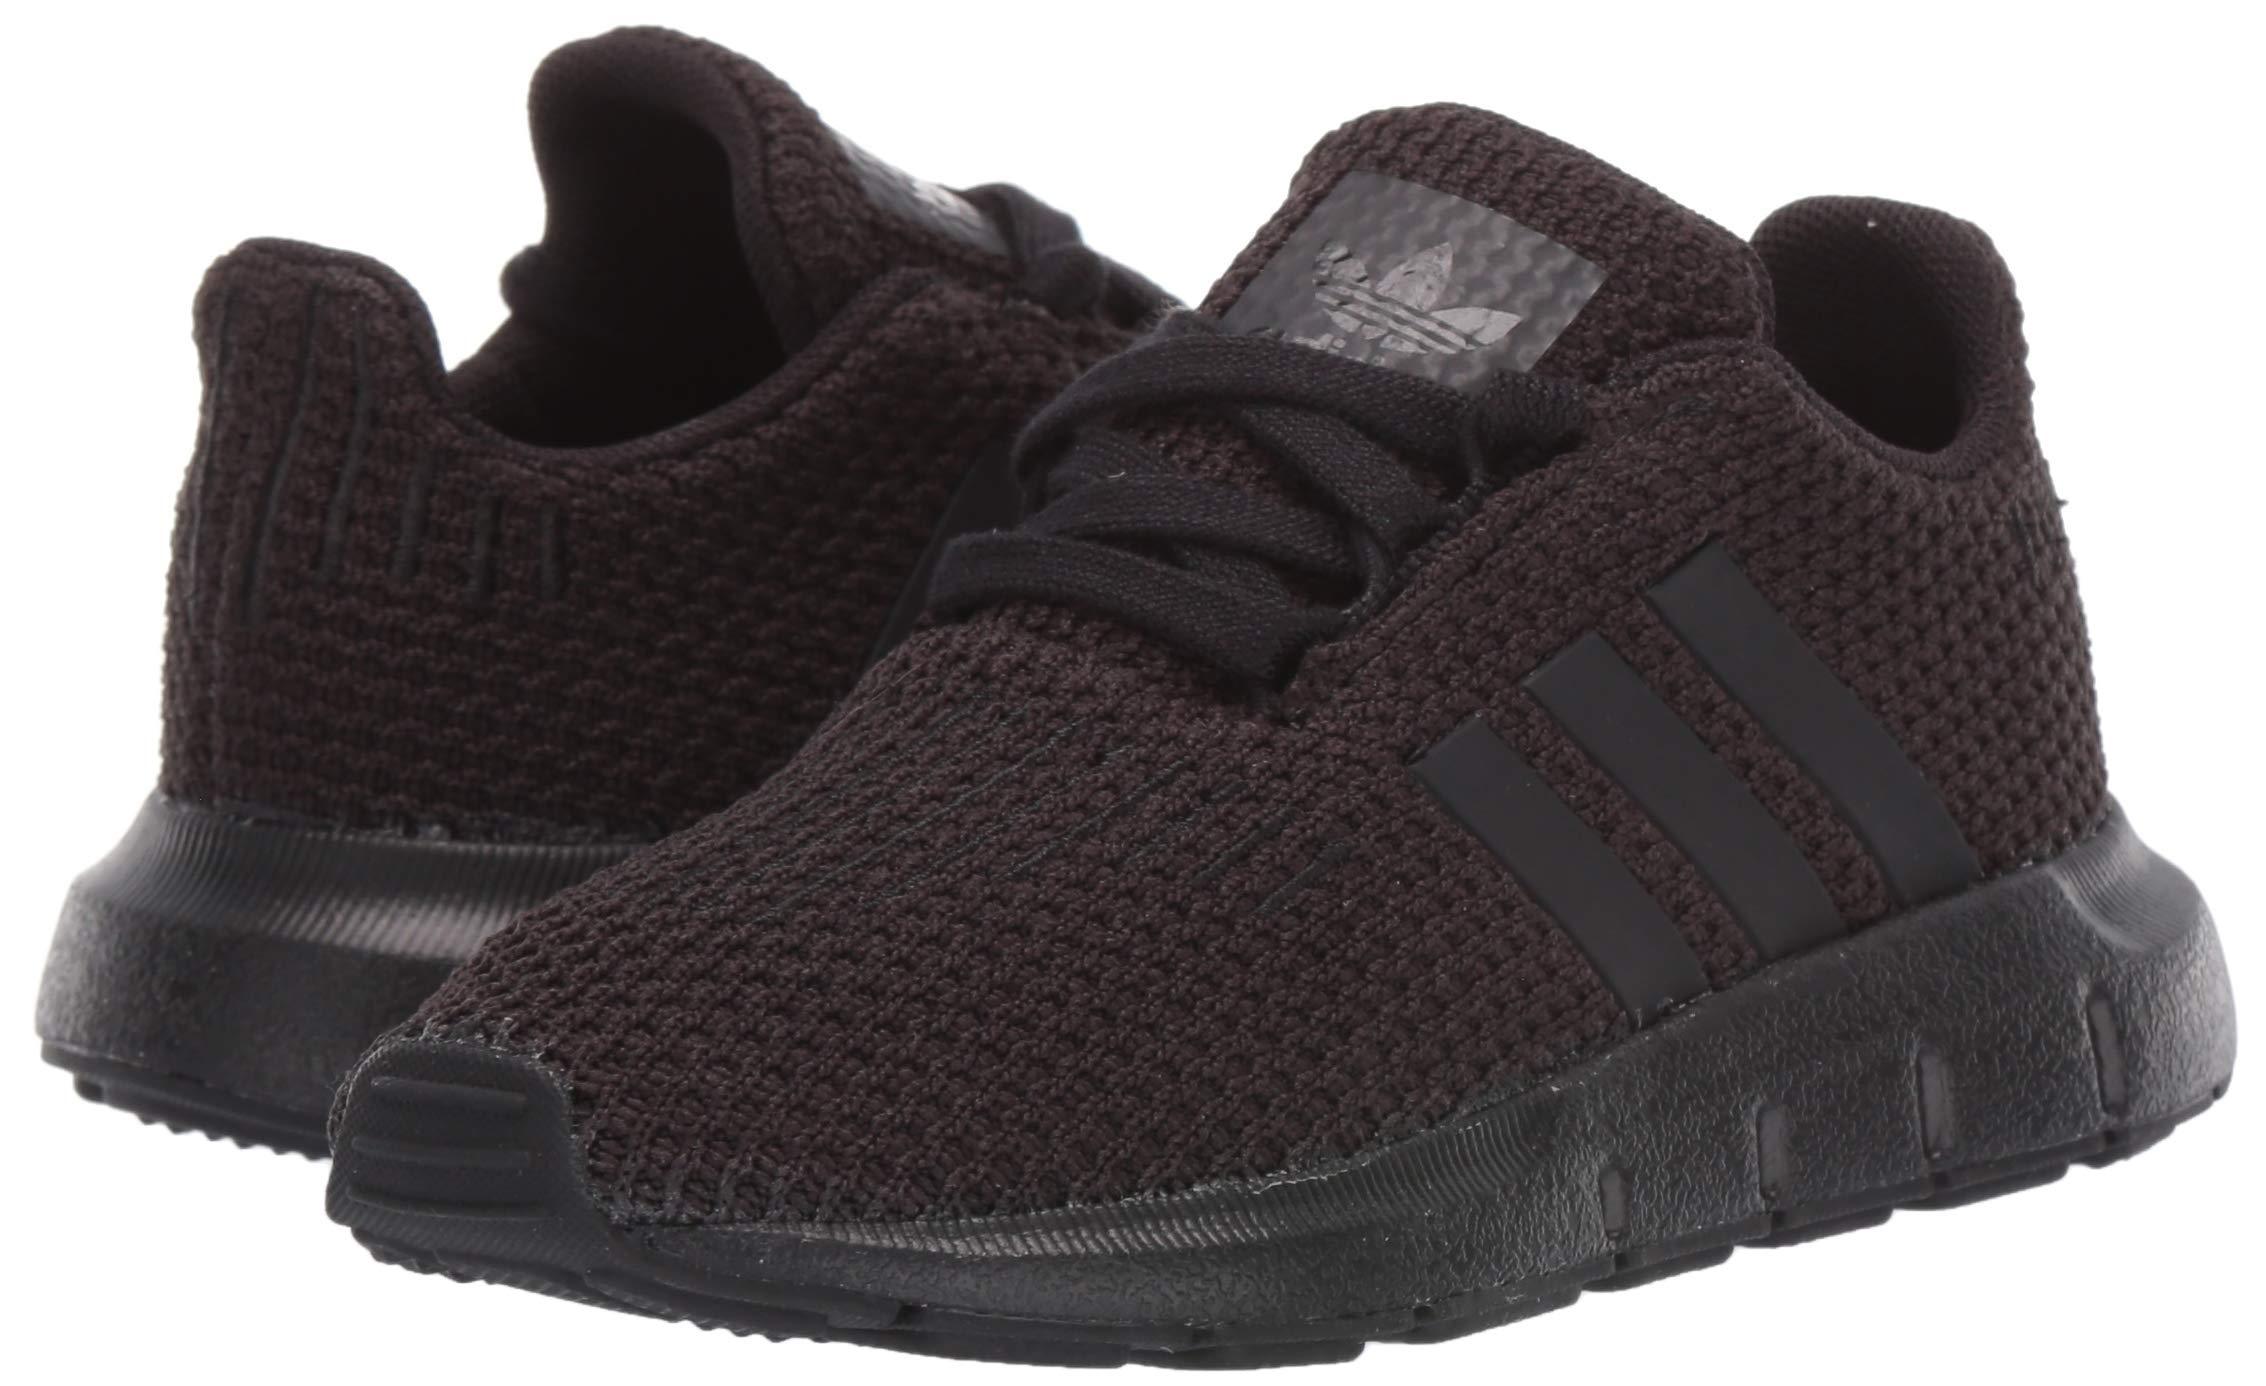 adidas Originals Baby Swift Running Shoe, Black, 5K M US Toddler by adidas Originals (Image #5)